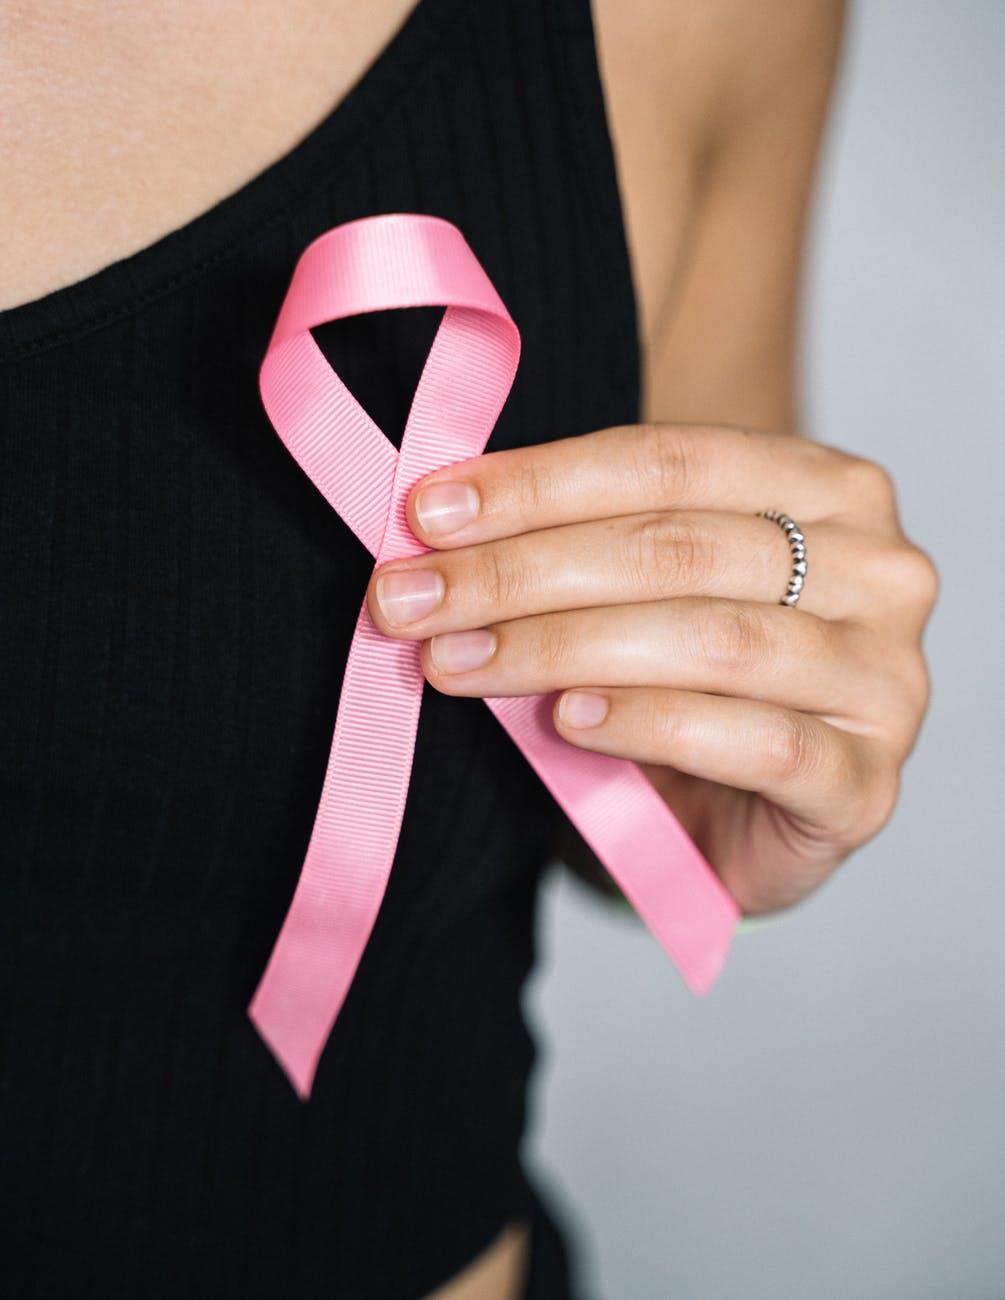 woman in black tank top holding pink ribbon